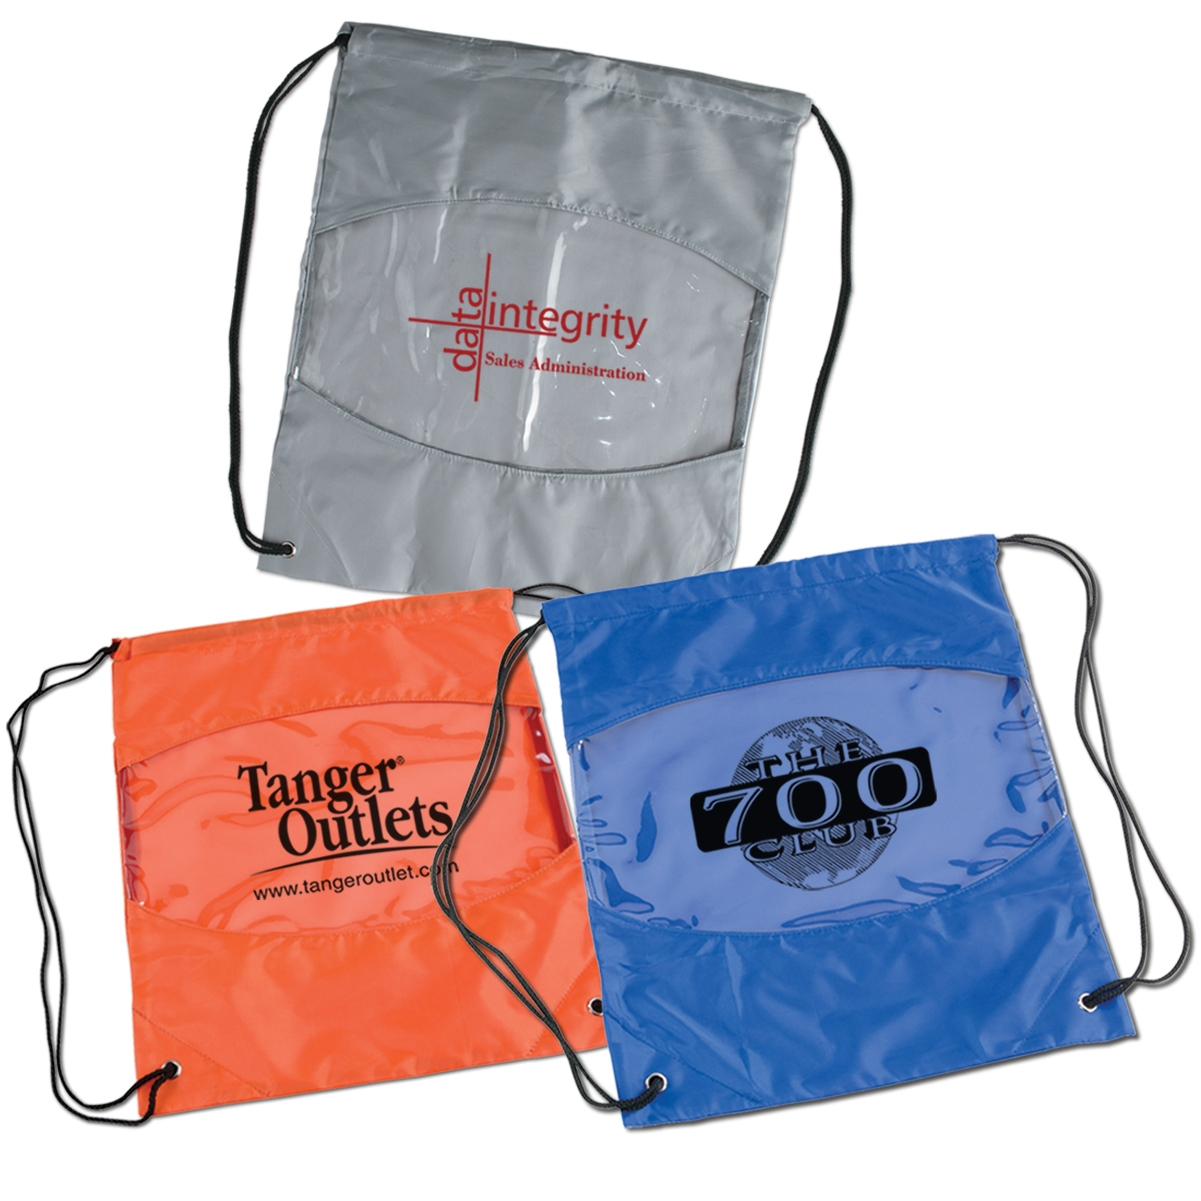 Clear View Drawstring Bag Prime Line